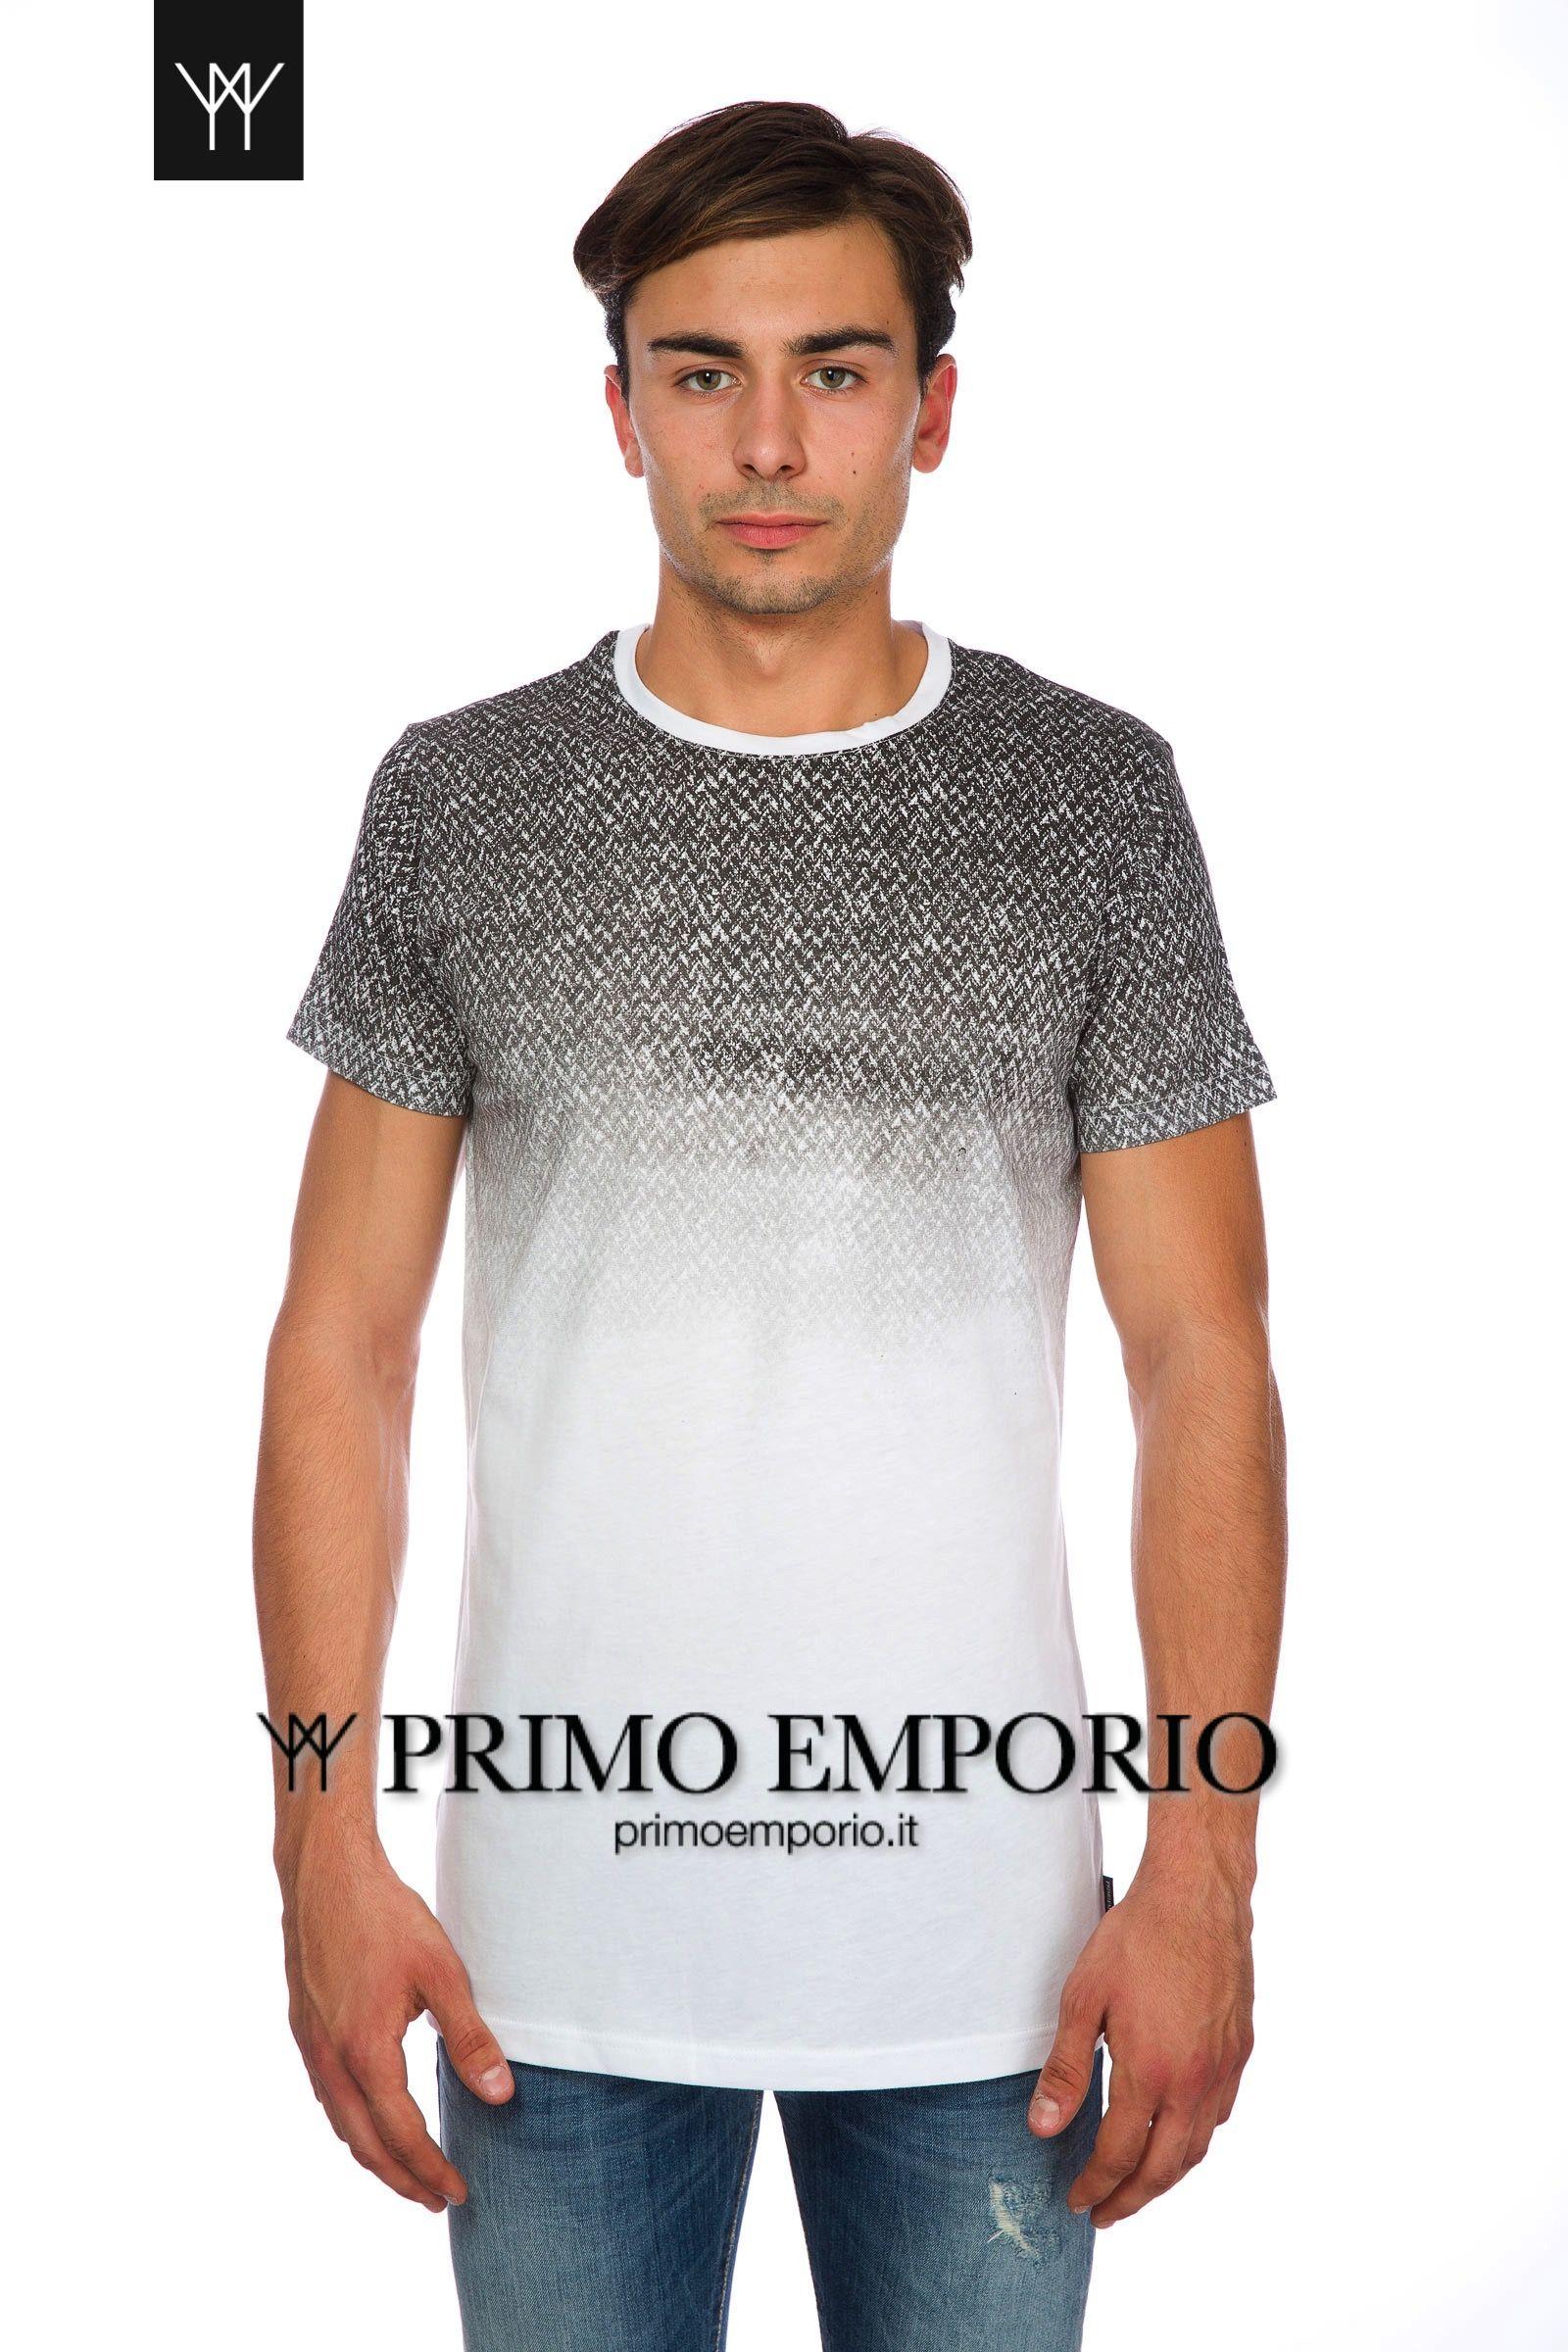 ● Today's #tshirt  and #happy Tuesday ● ● Shop On-Line www.primoemporio.it  #primoemporio #ootd #shoponline #moda #fashion #fw15 #work #look #lookoftheday #madeitaly #italia #mood #style #collection